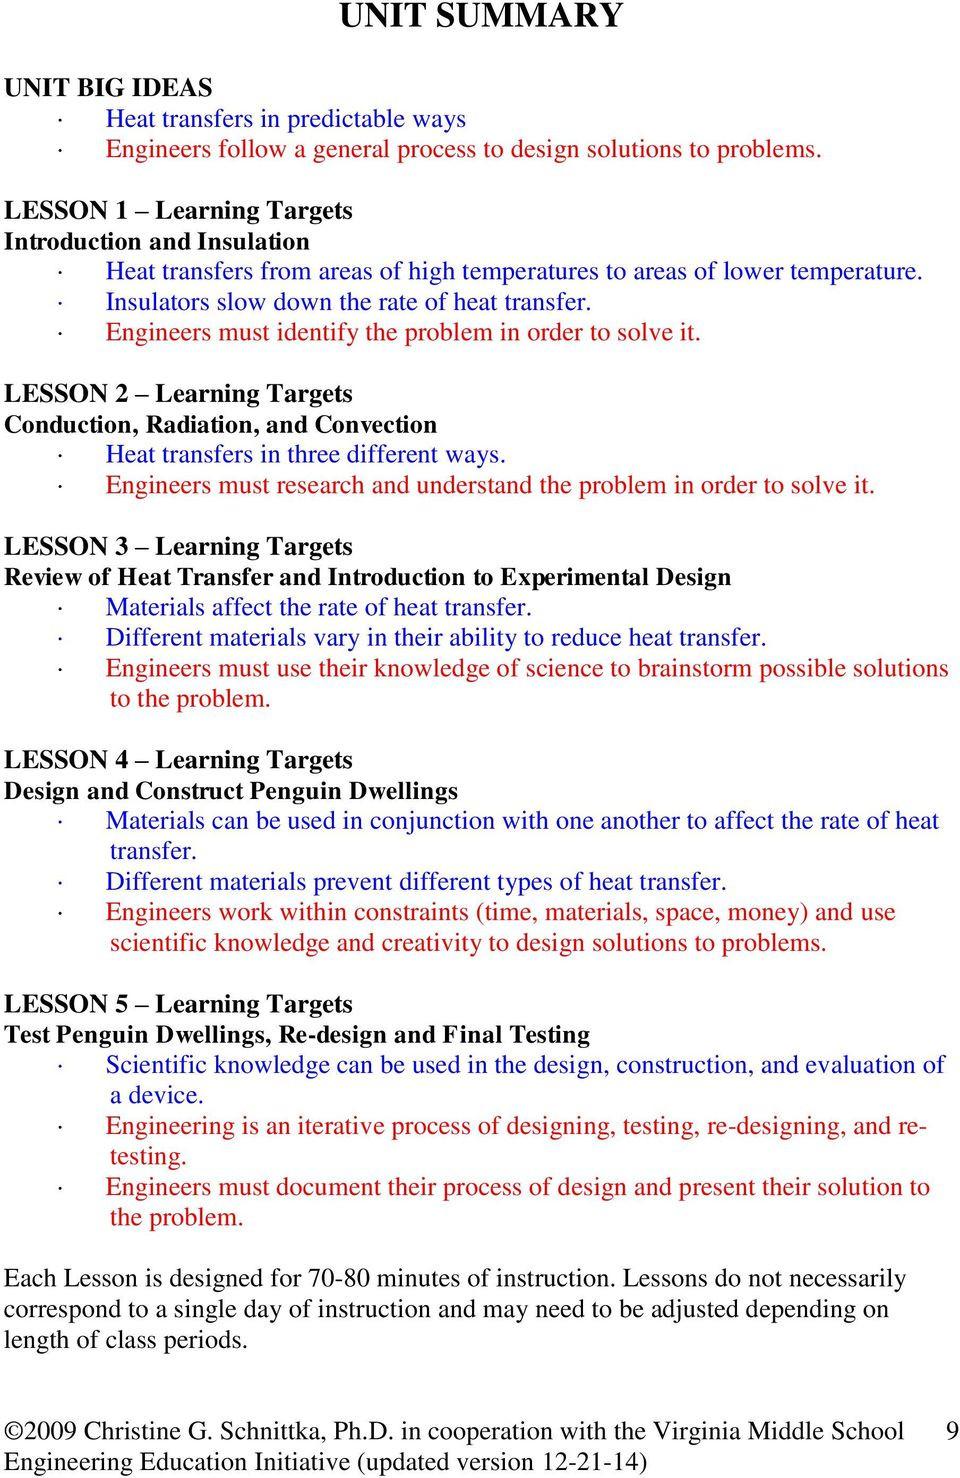 Heat Transfer Worksheet Answers Heat Transfer Worksheet Middle School Nidecmege